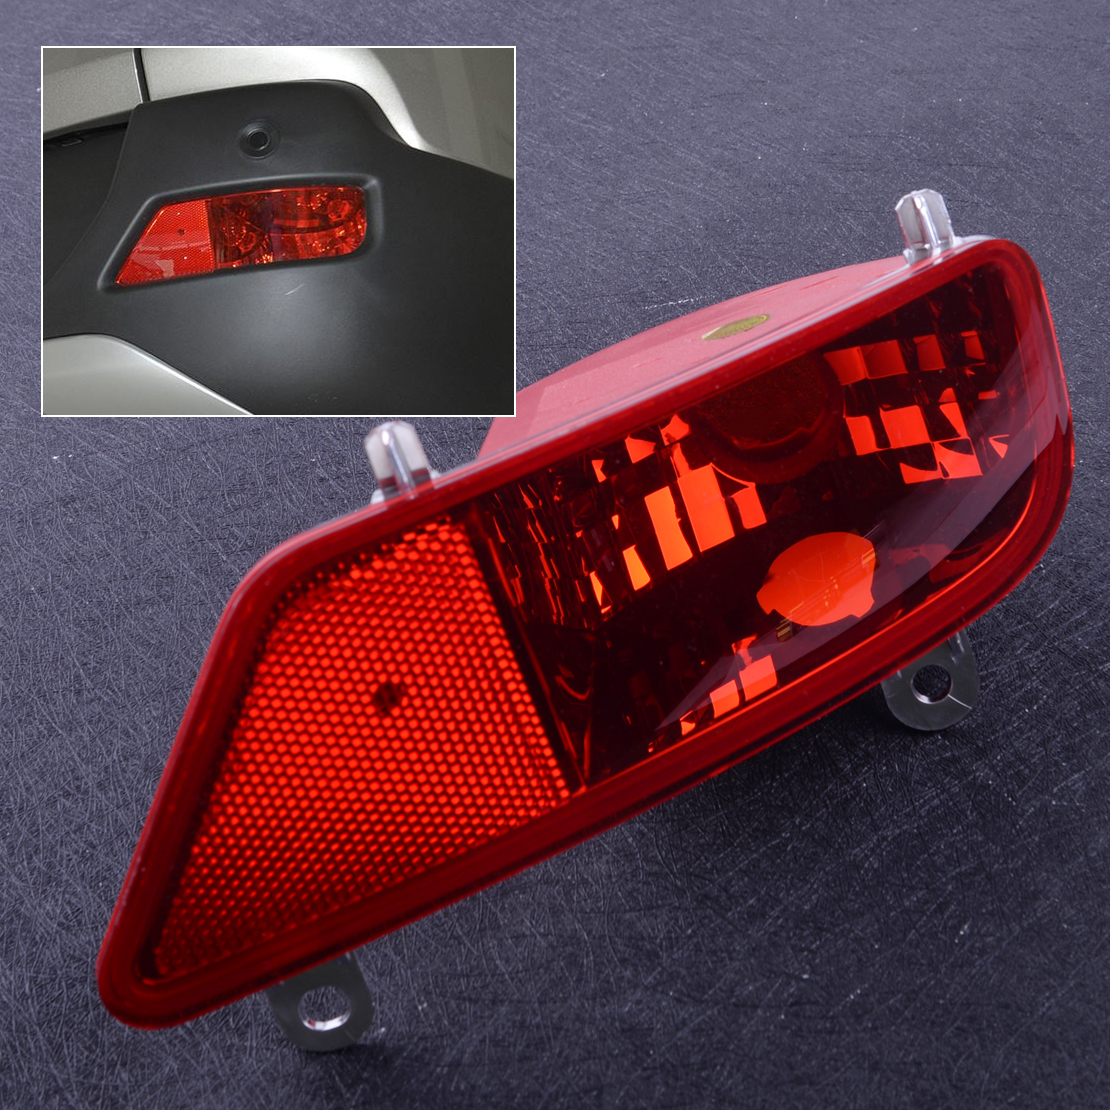 CITALL Right Rear Tail Bumper Fog Light Lamp Cover Case Shell Fit For Peugeot 3008 2009 2010 2011 2012 2013 2014 2015